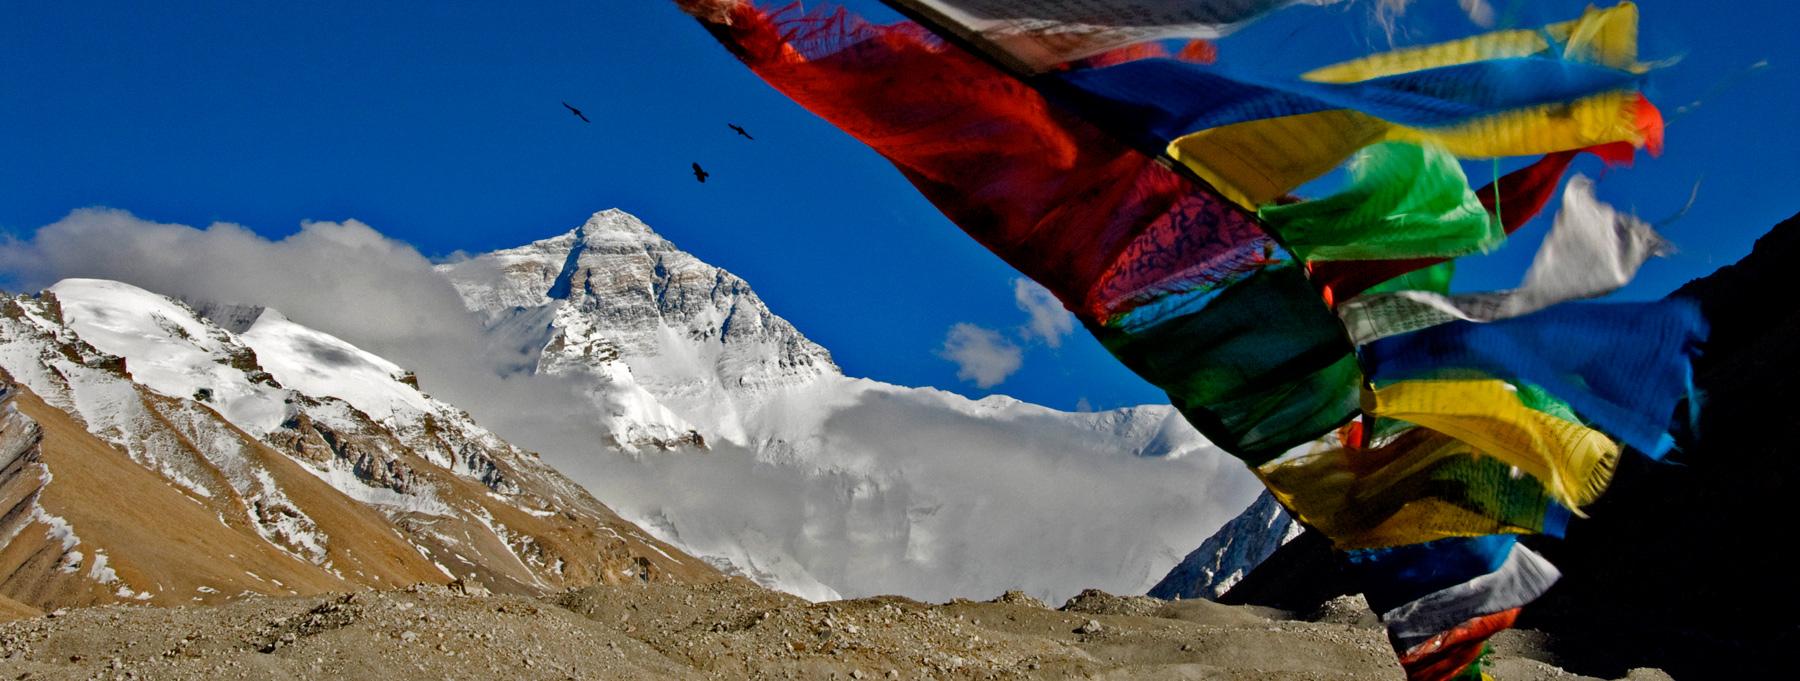 Jimmy Chin Everest 3 Ravens Print